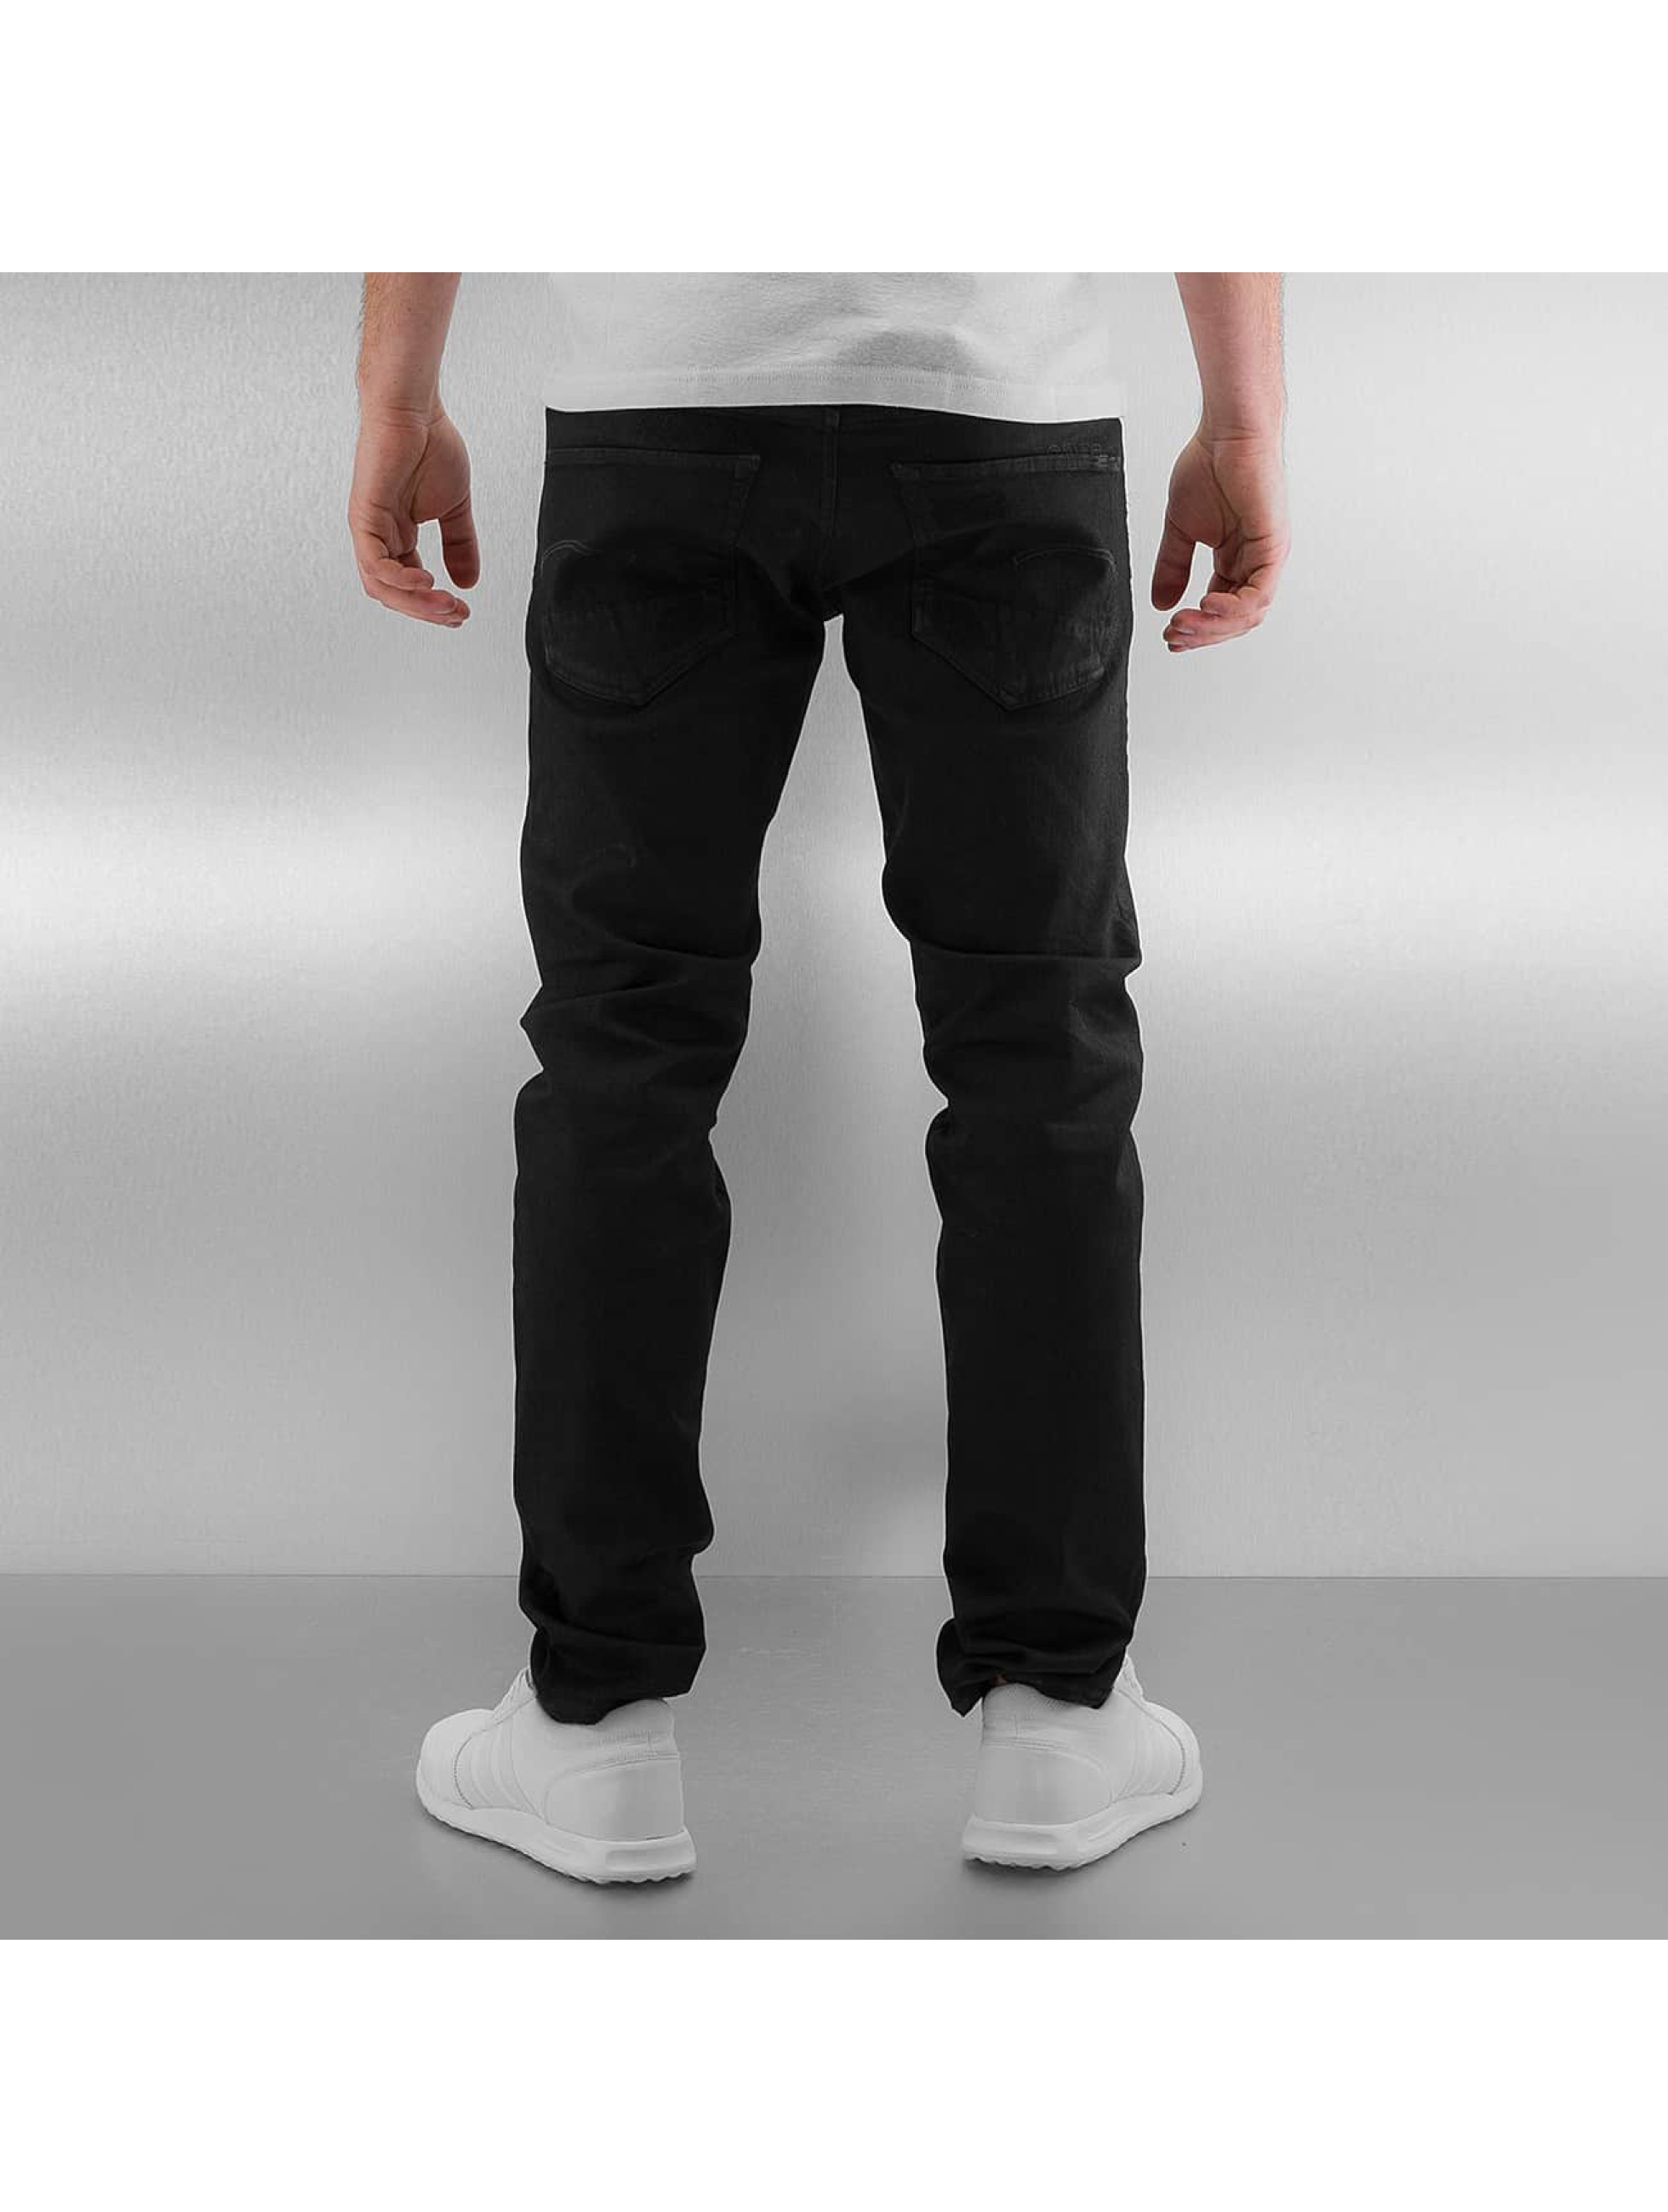 G-Star Straight Fit Jeans 3301 Slim Turner schwarz